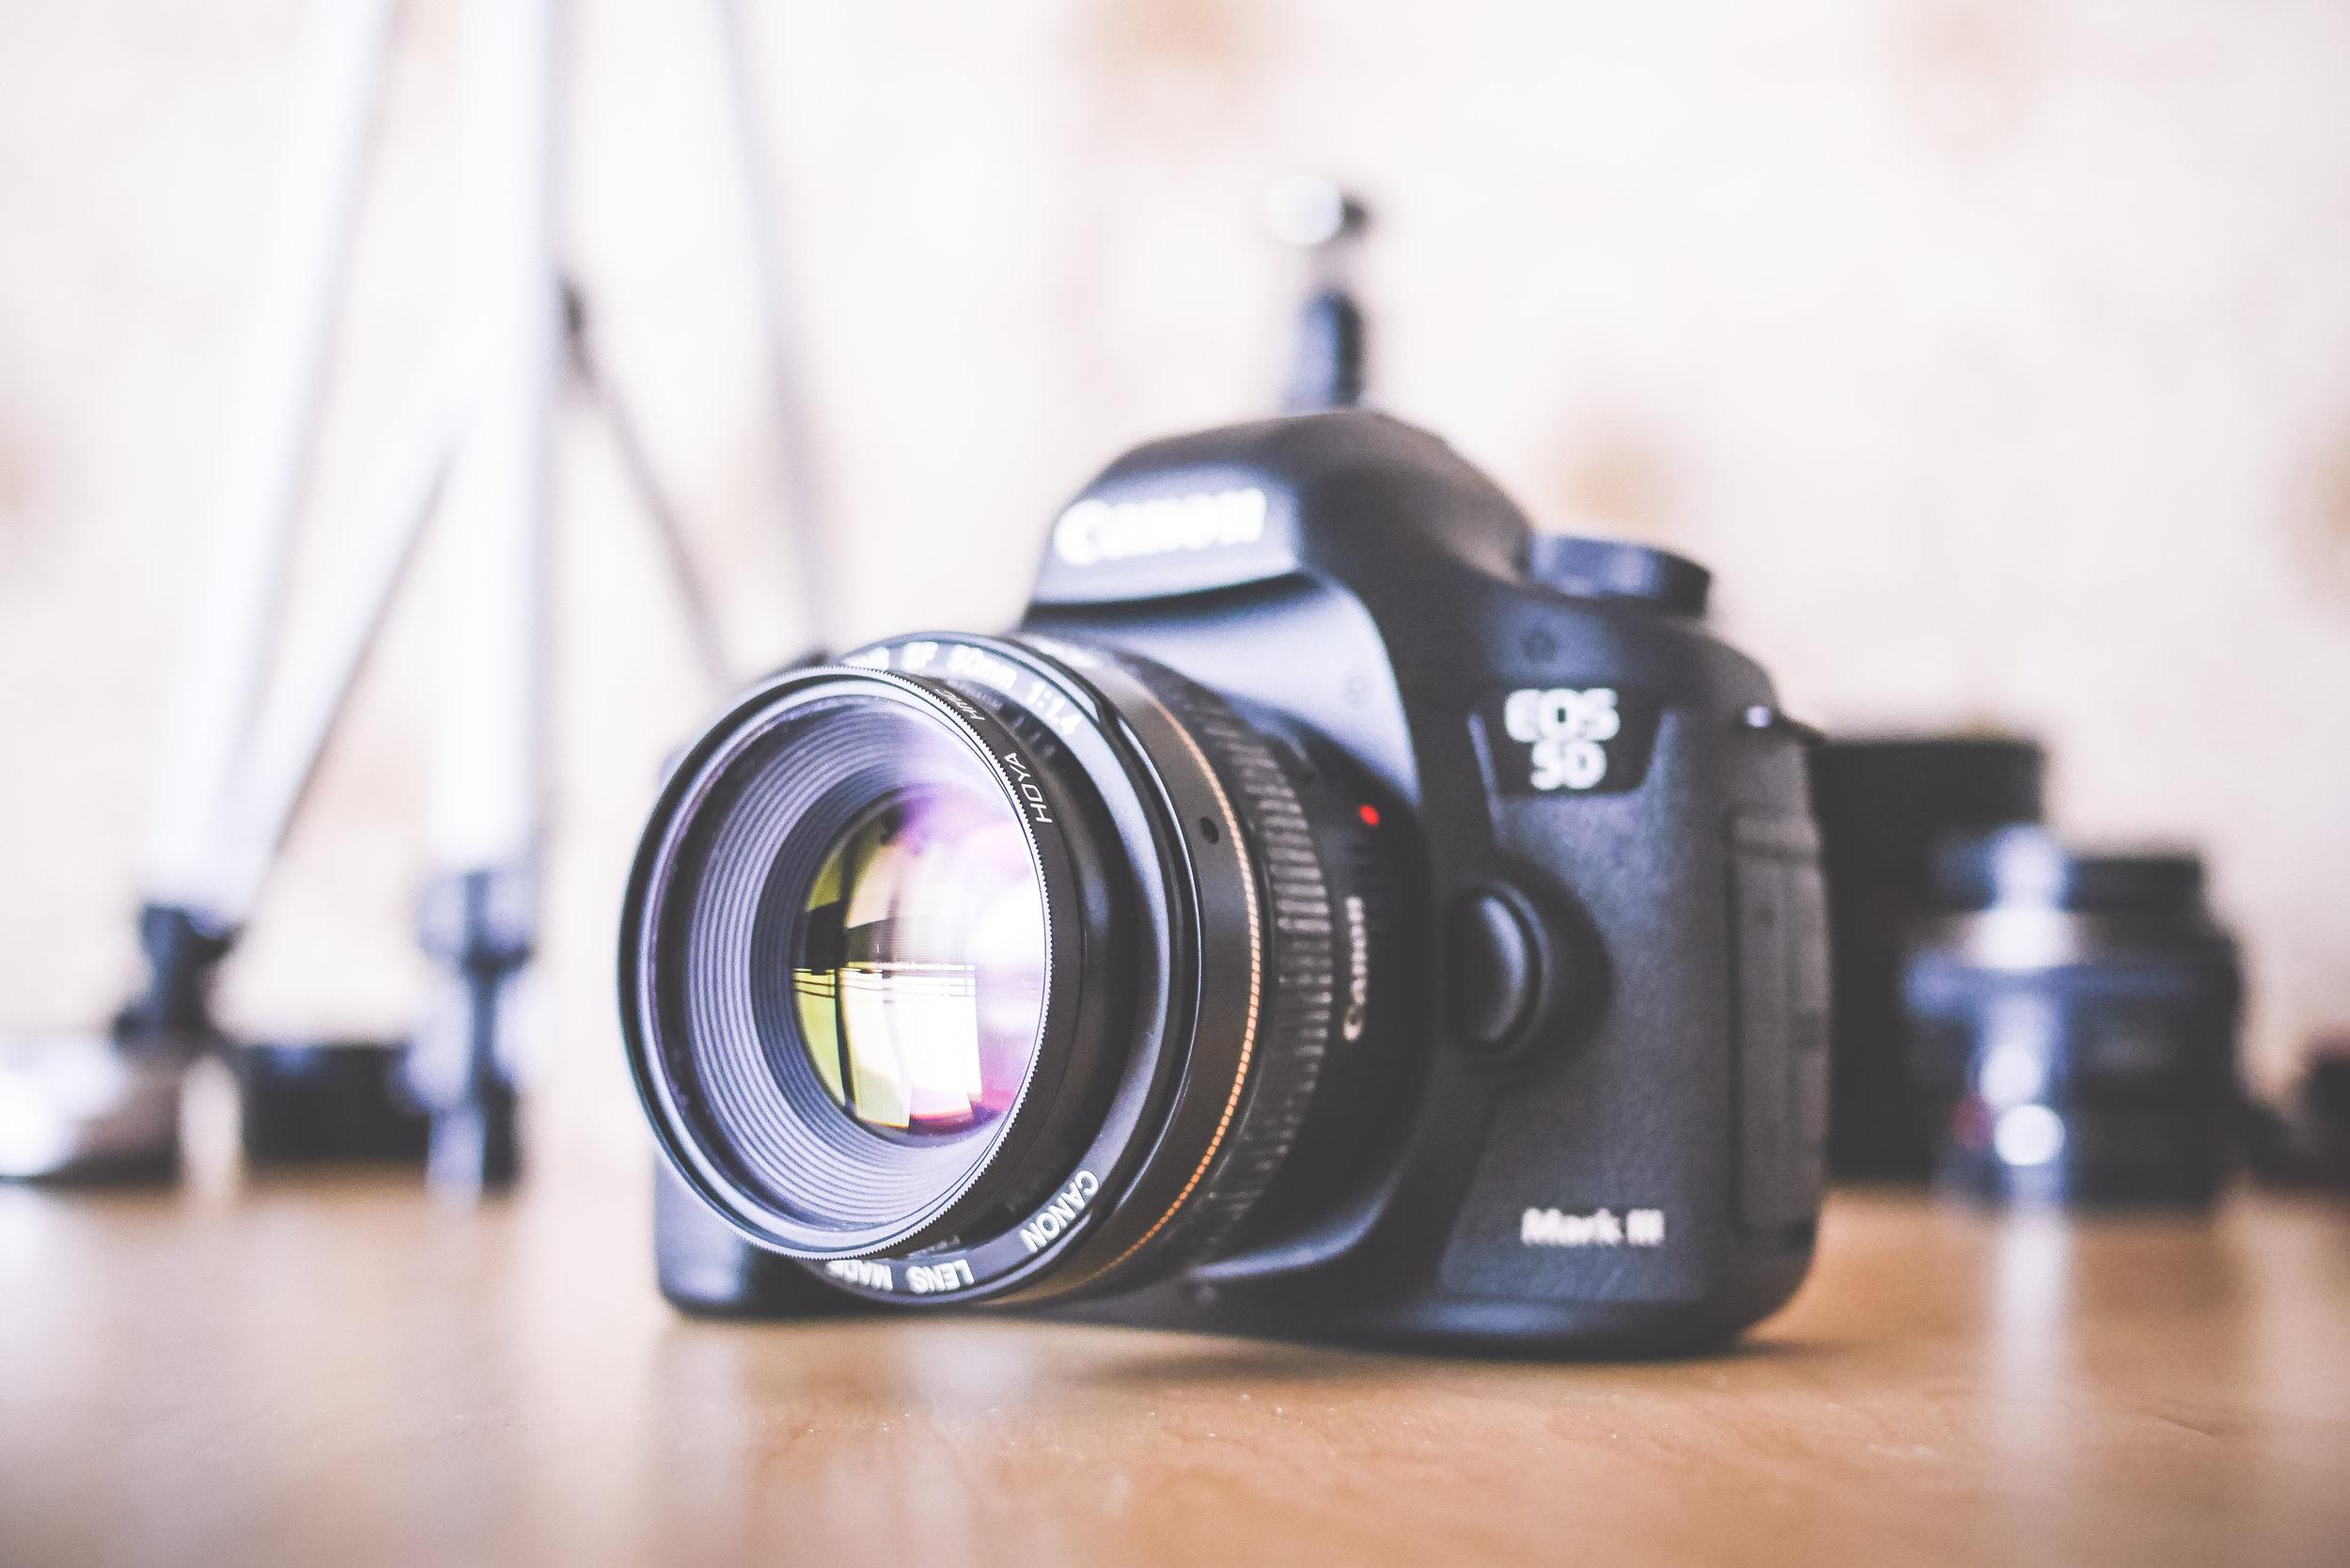 big-dslr-camera-and-equipment-picjumbo-com.jpg